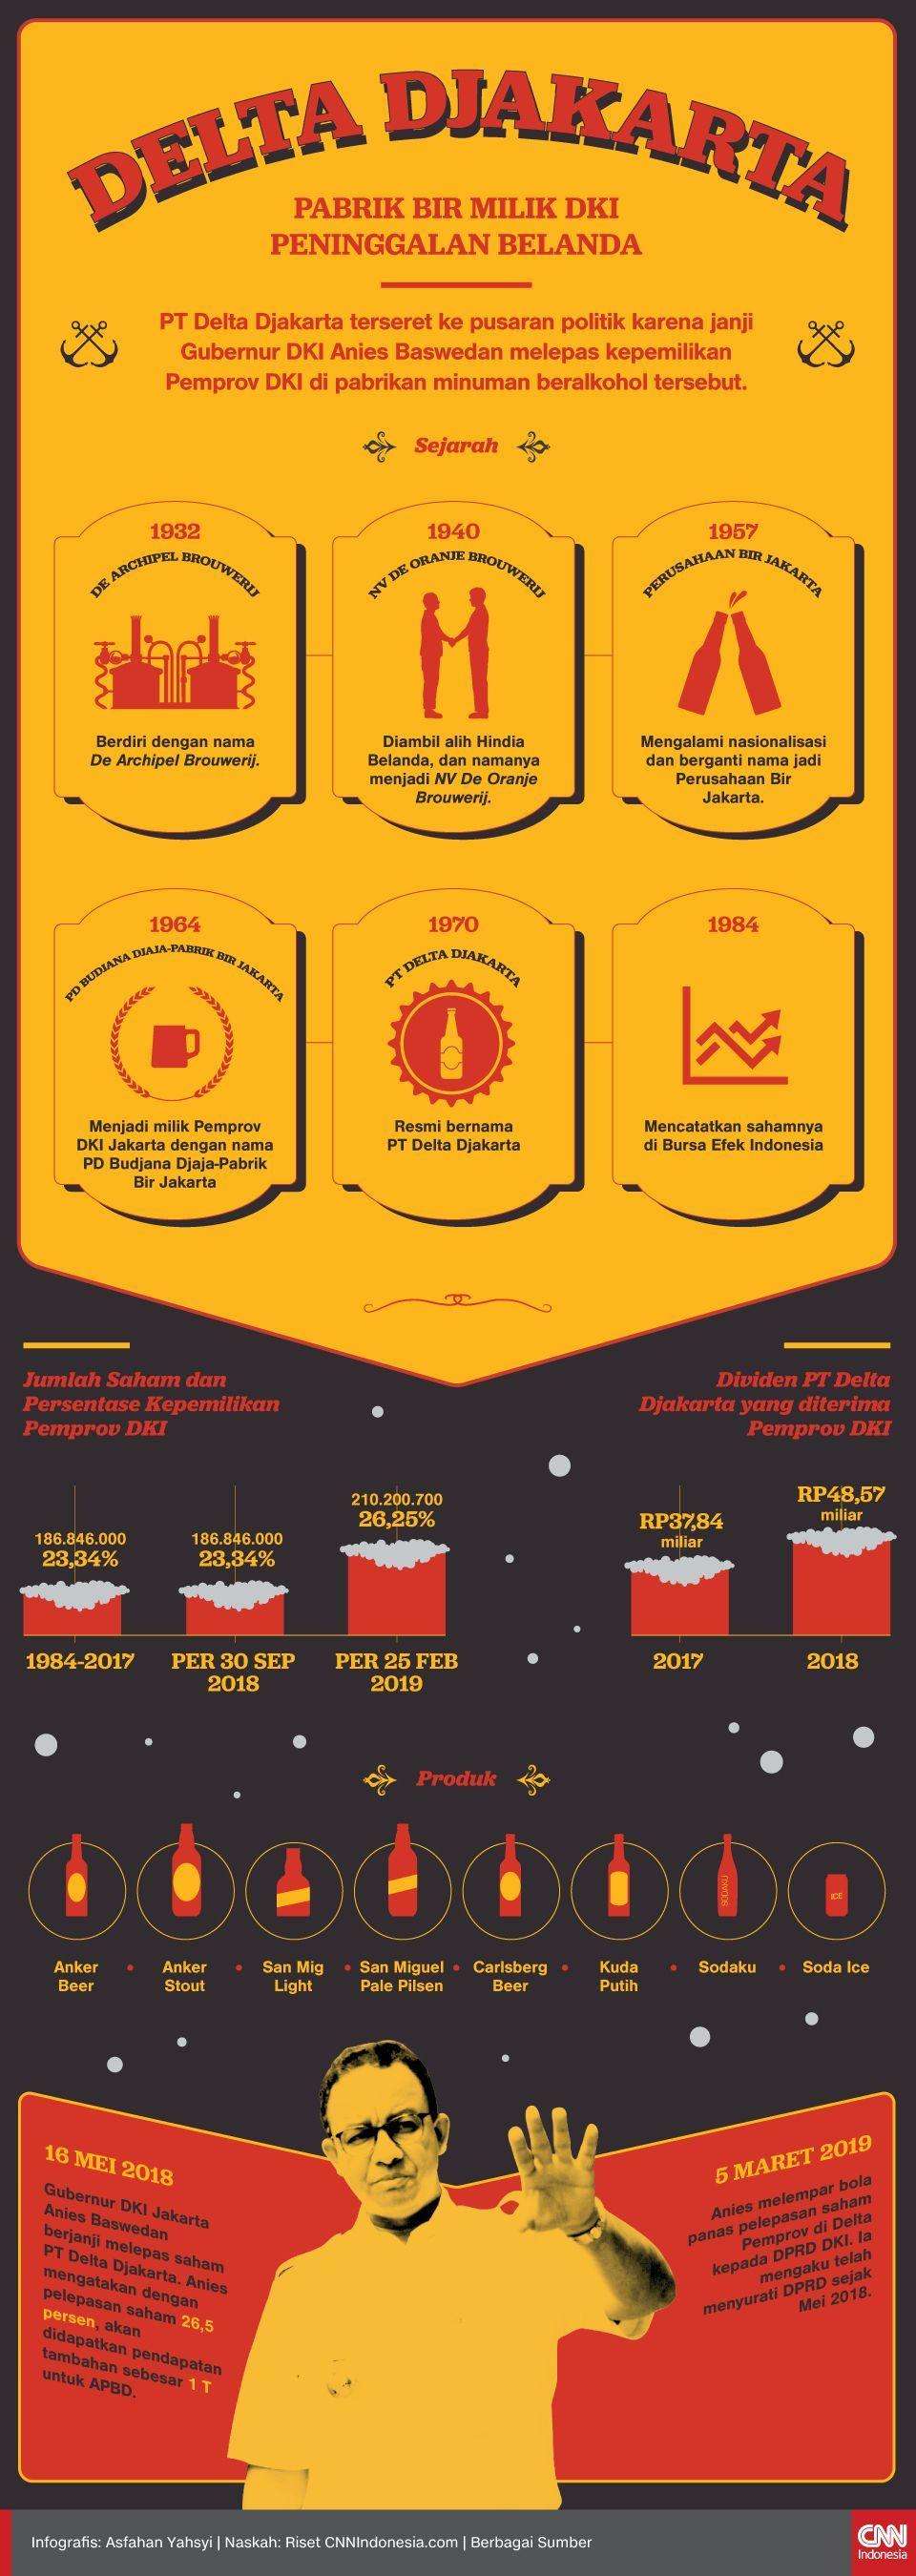 Infografis Delta Djakarta, Pabrik Bir Milik DKI Peninggalan Belanda